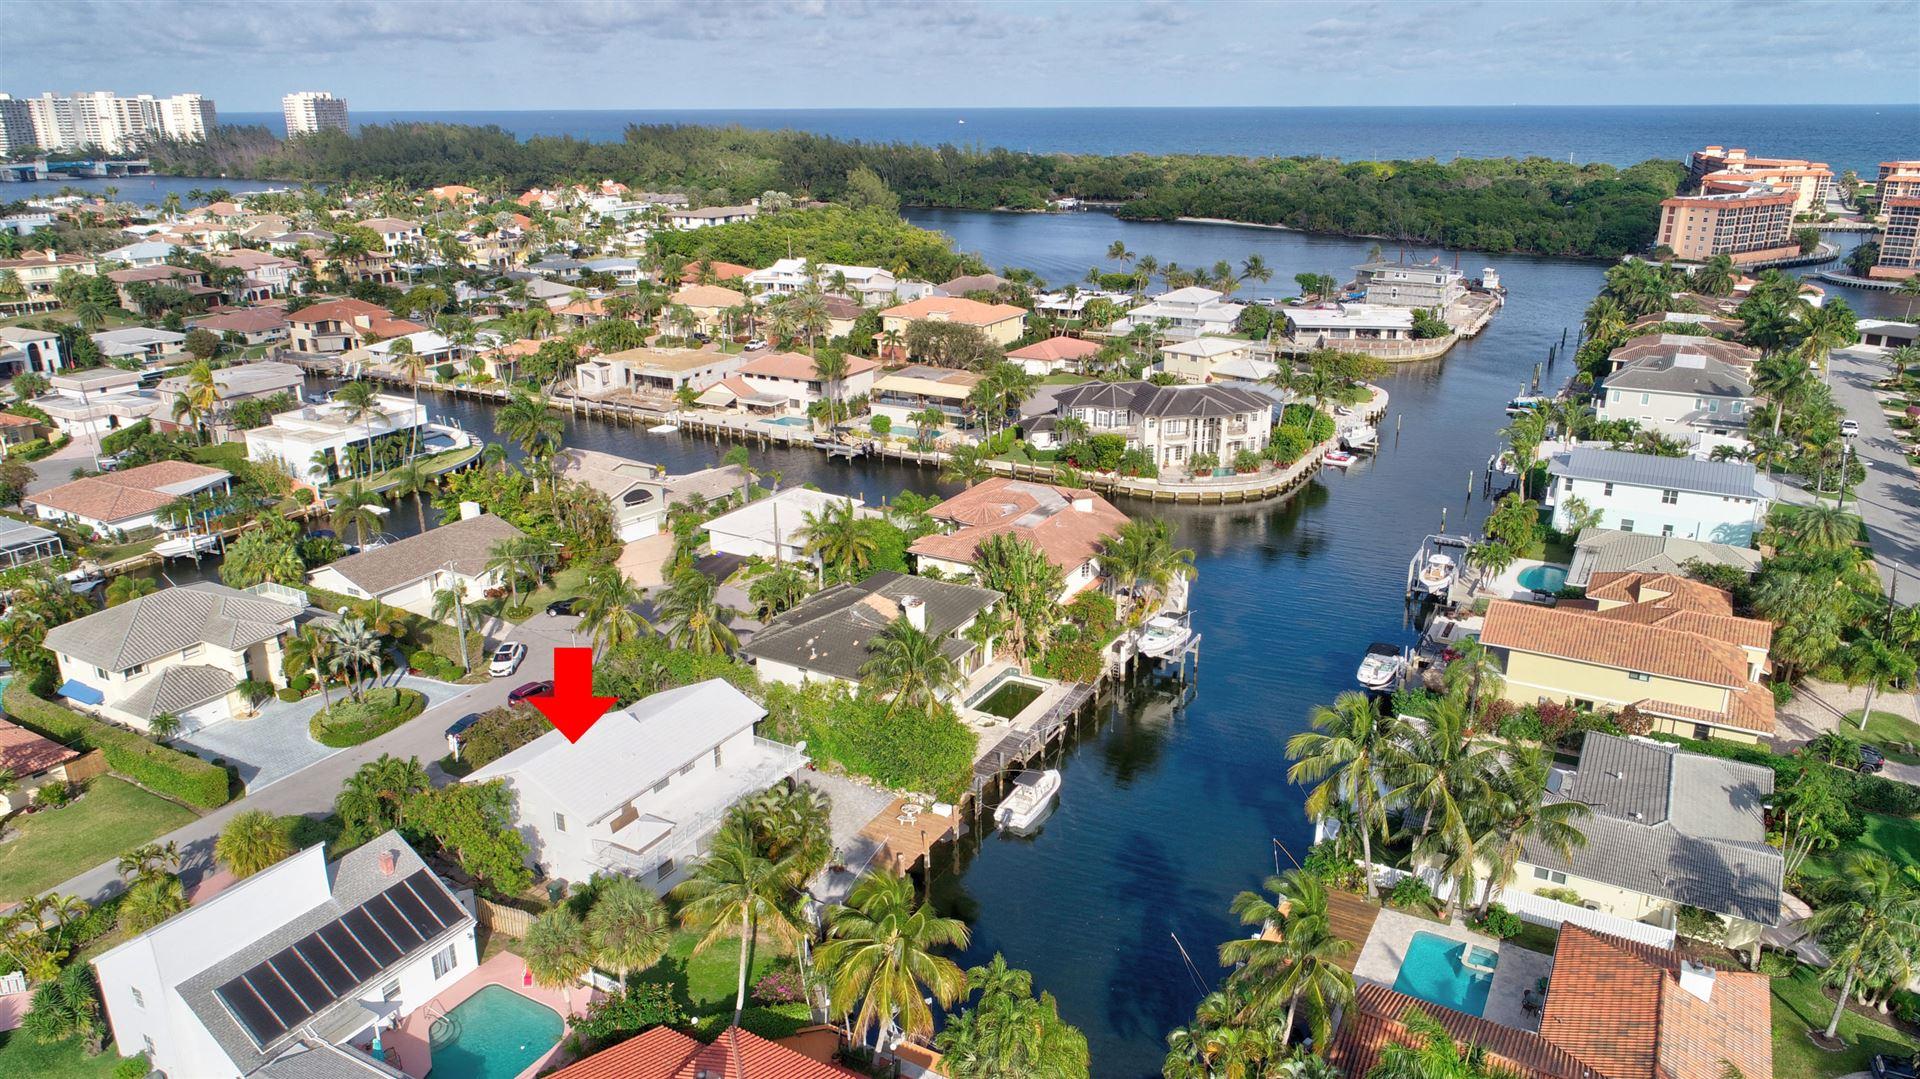 660 NE 29th Place, Boca Raton, FL 33431 - #: RX-10598843